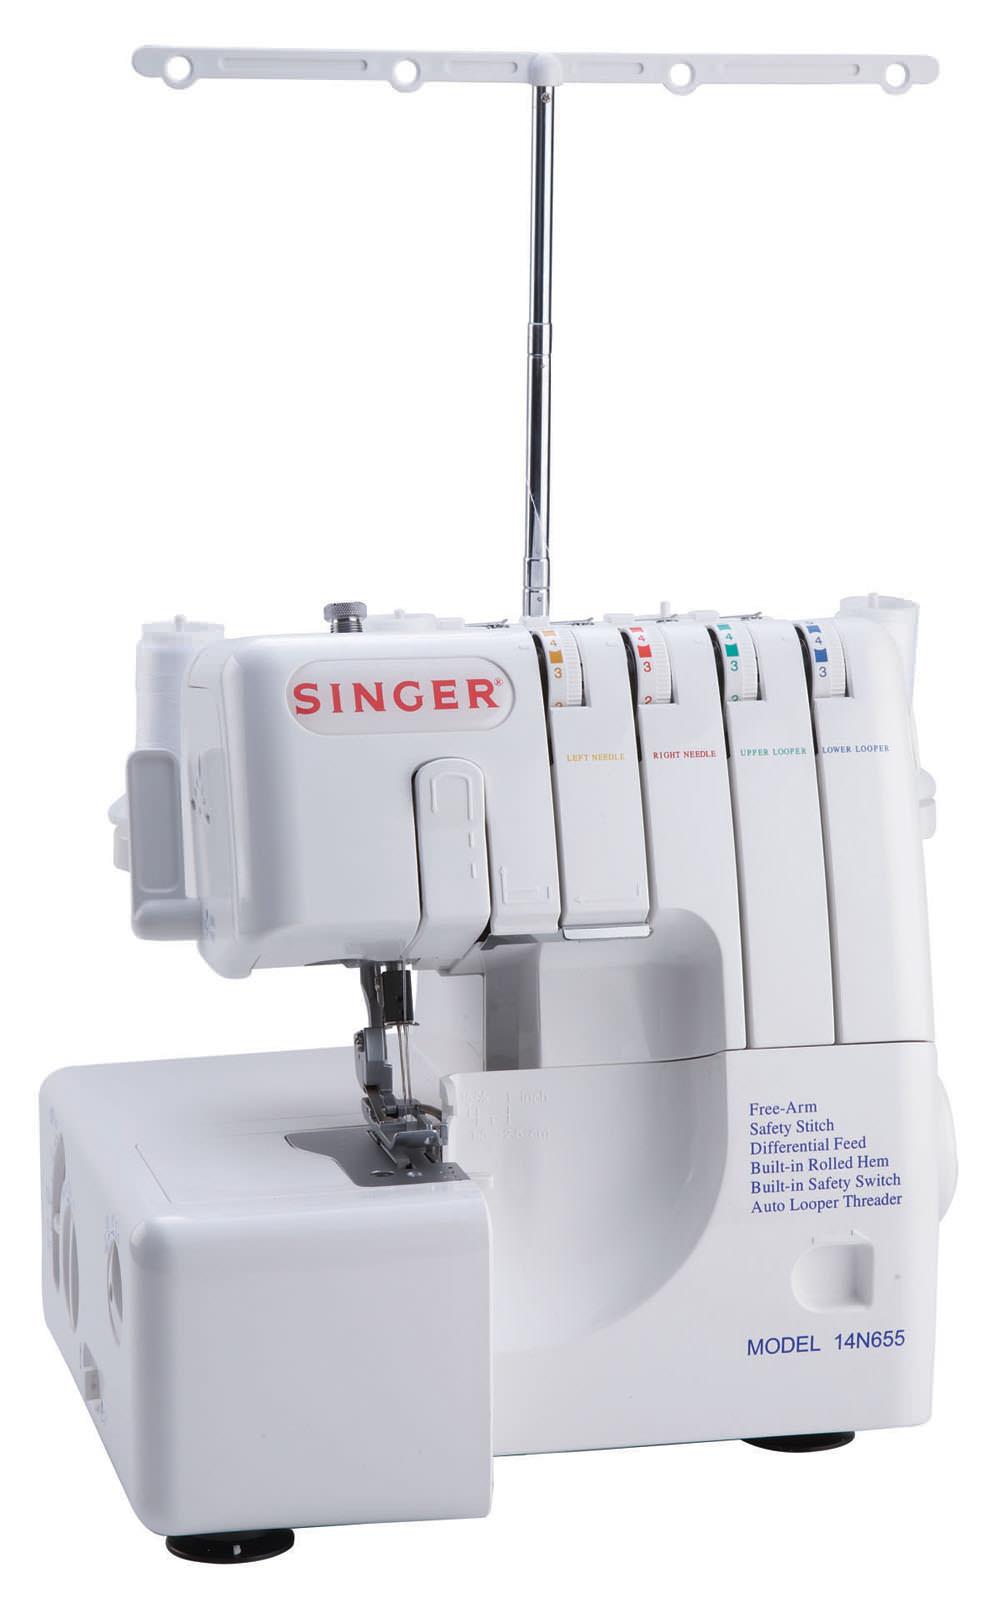 Sewing Machine Singer Malaysia Mesin Jahit Digital Portable 7285q Patchwork